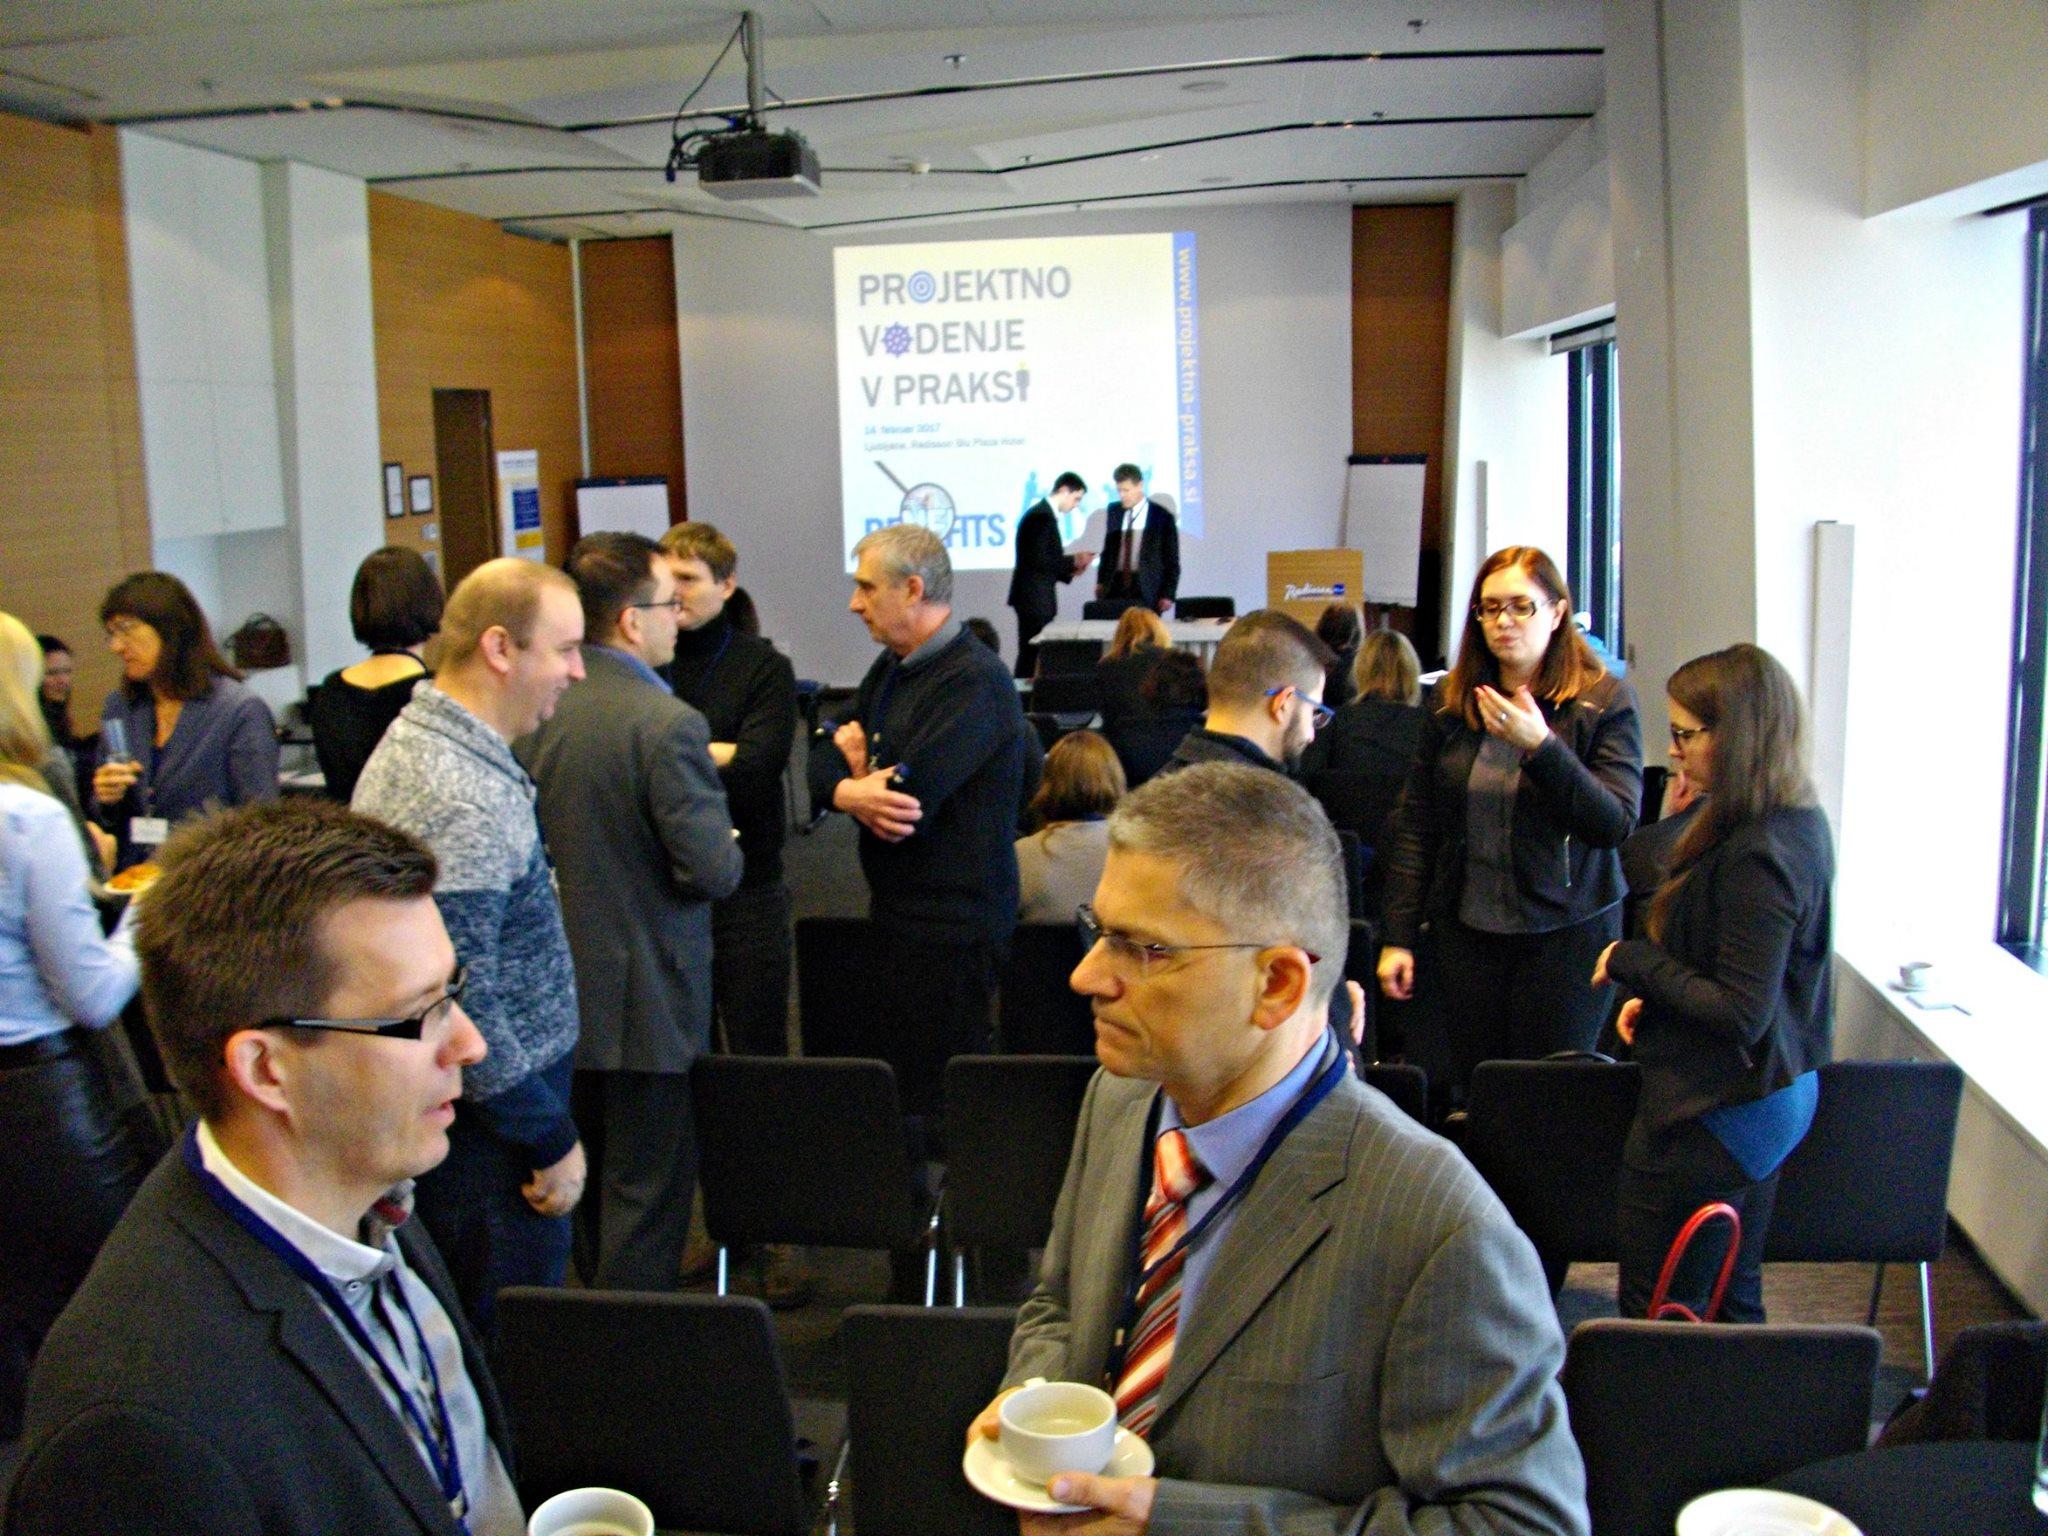 Konferenca: Multi-projektno okolje